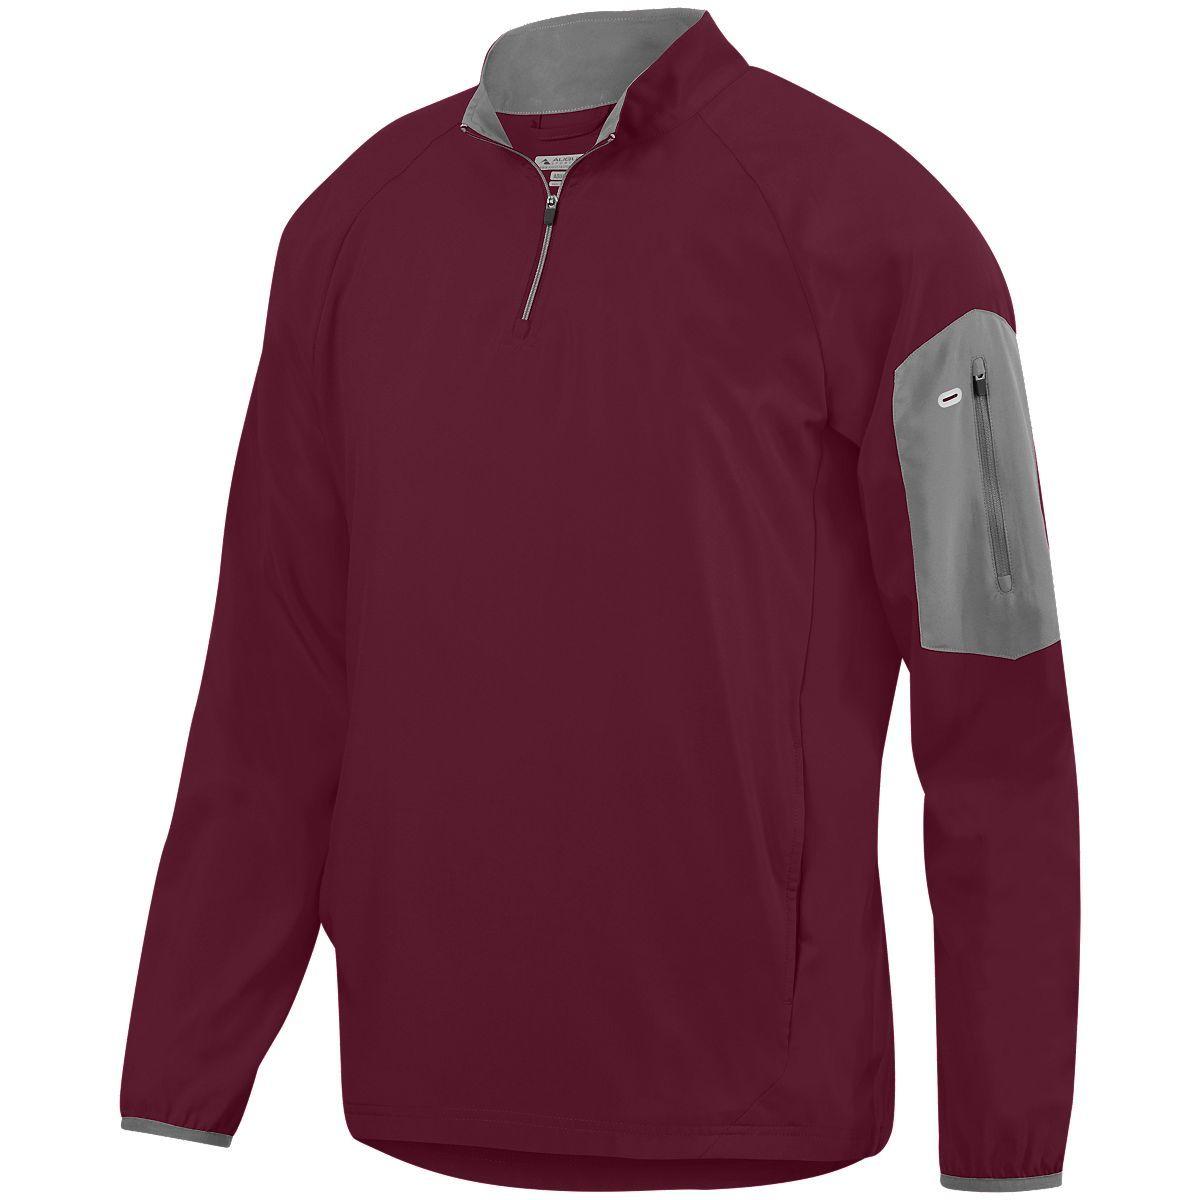 Preeminent Half-Zip Pullover - MAROON/GRAPHITE